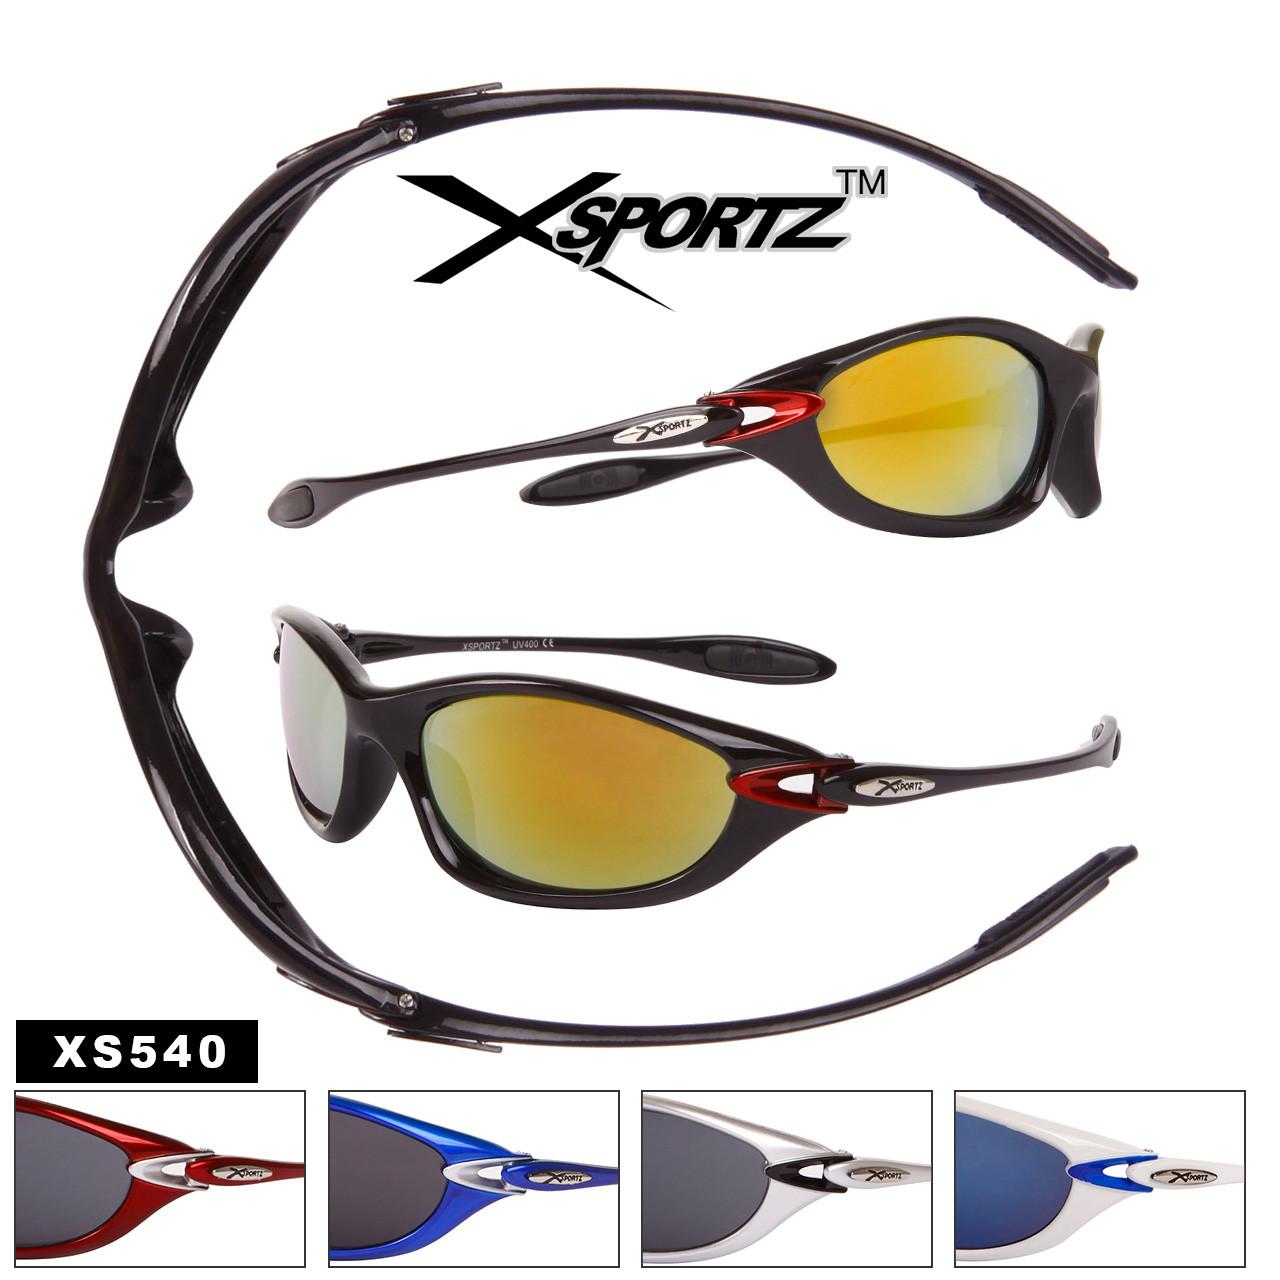 Xsportz™ Bulk Sports Sunglass - Style #XS540 (Assorted Colors) (12 pcs.)